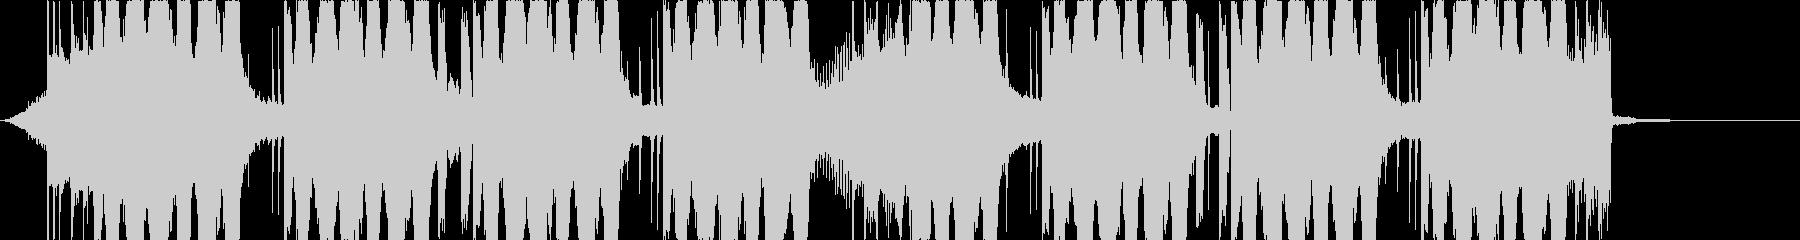 FutureBass3、洋楽、爽快、夏cの未再生の波形